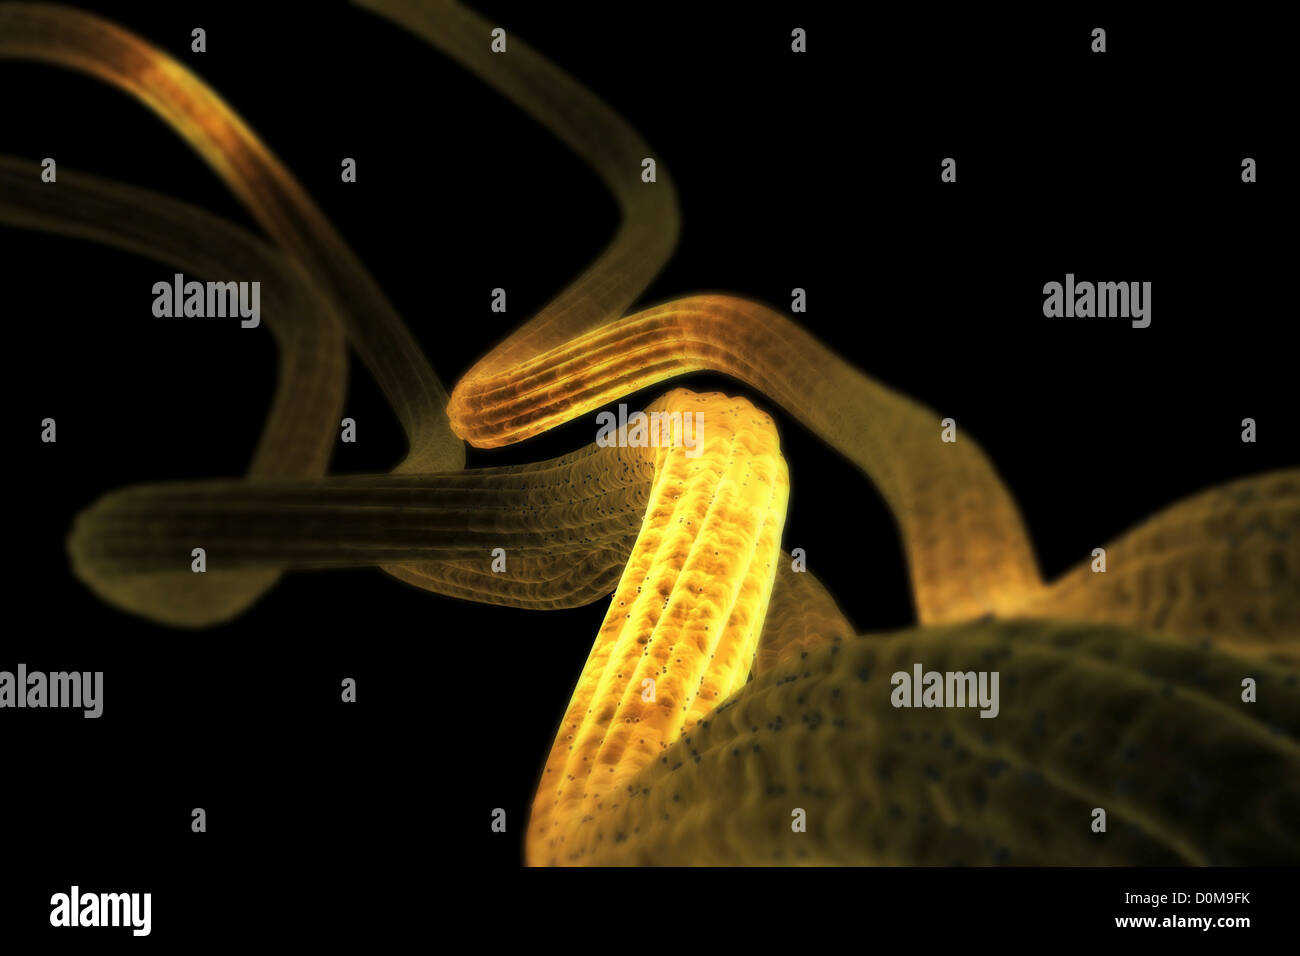 Microscopic styled visualization of nerve fibers. - Stock Image